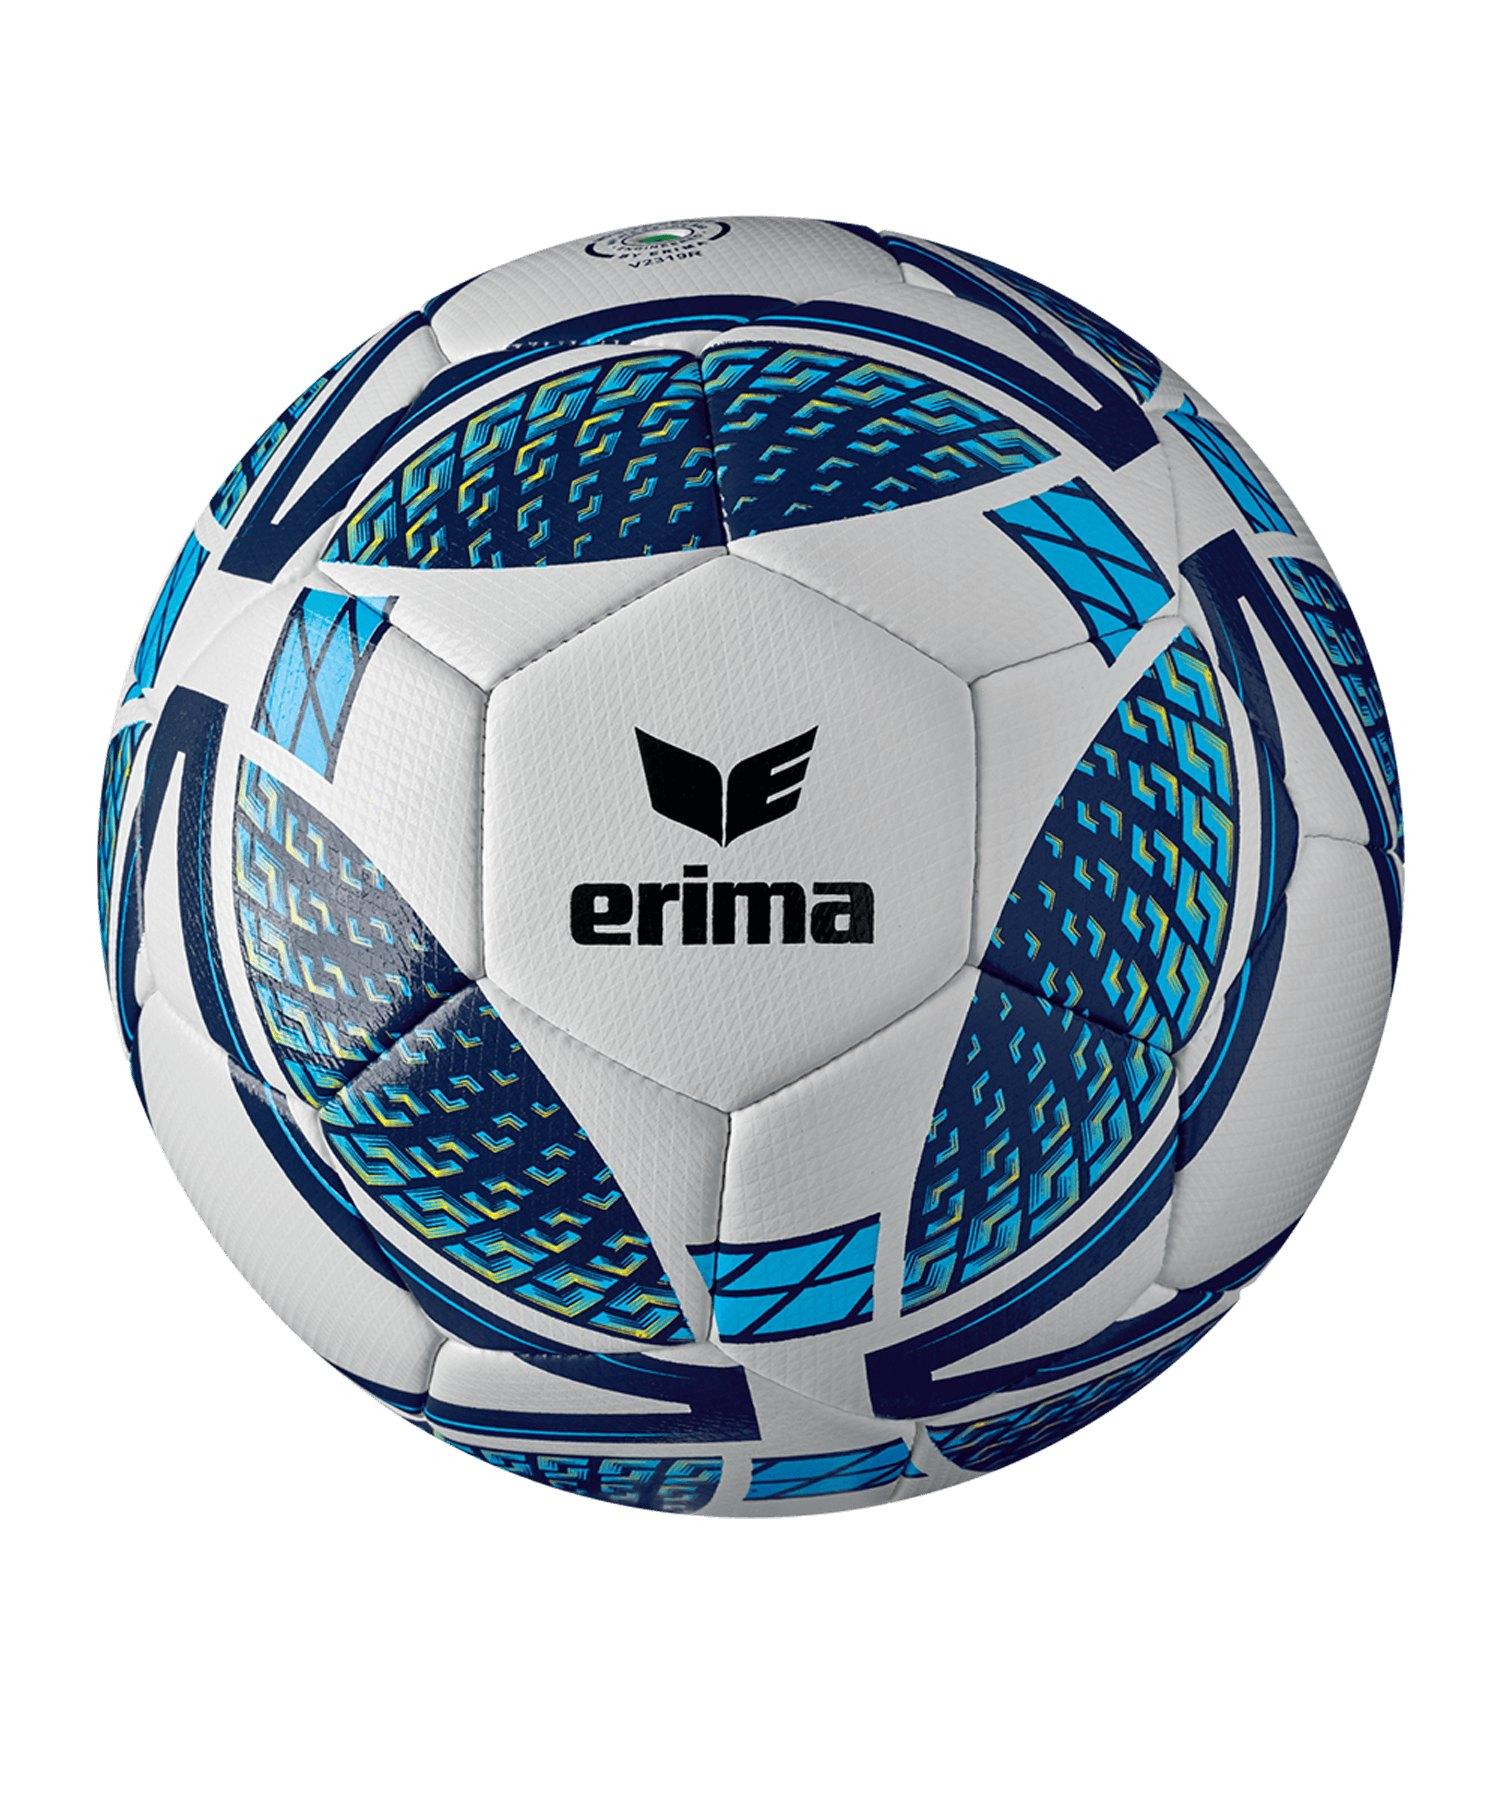 Erima Senzor Trainingsball 430 Gramm Gr. 5 Blau - blau